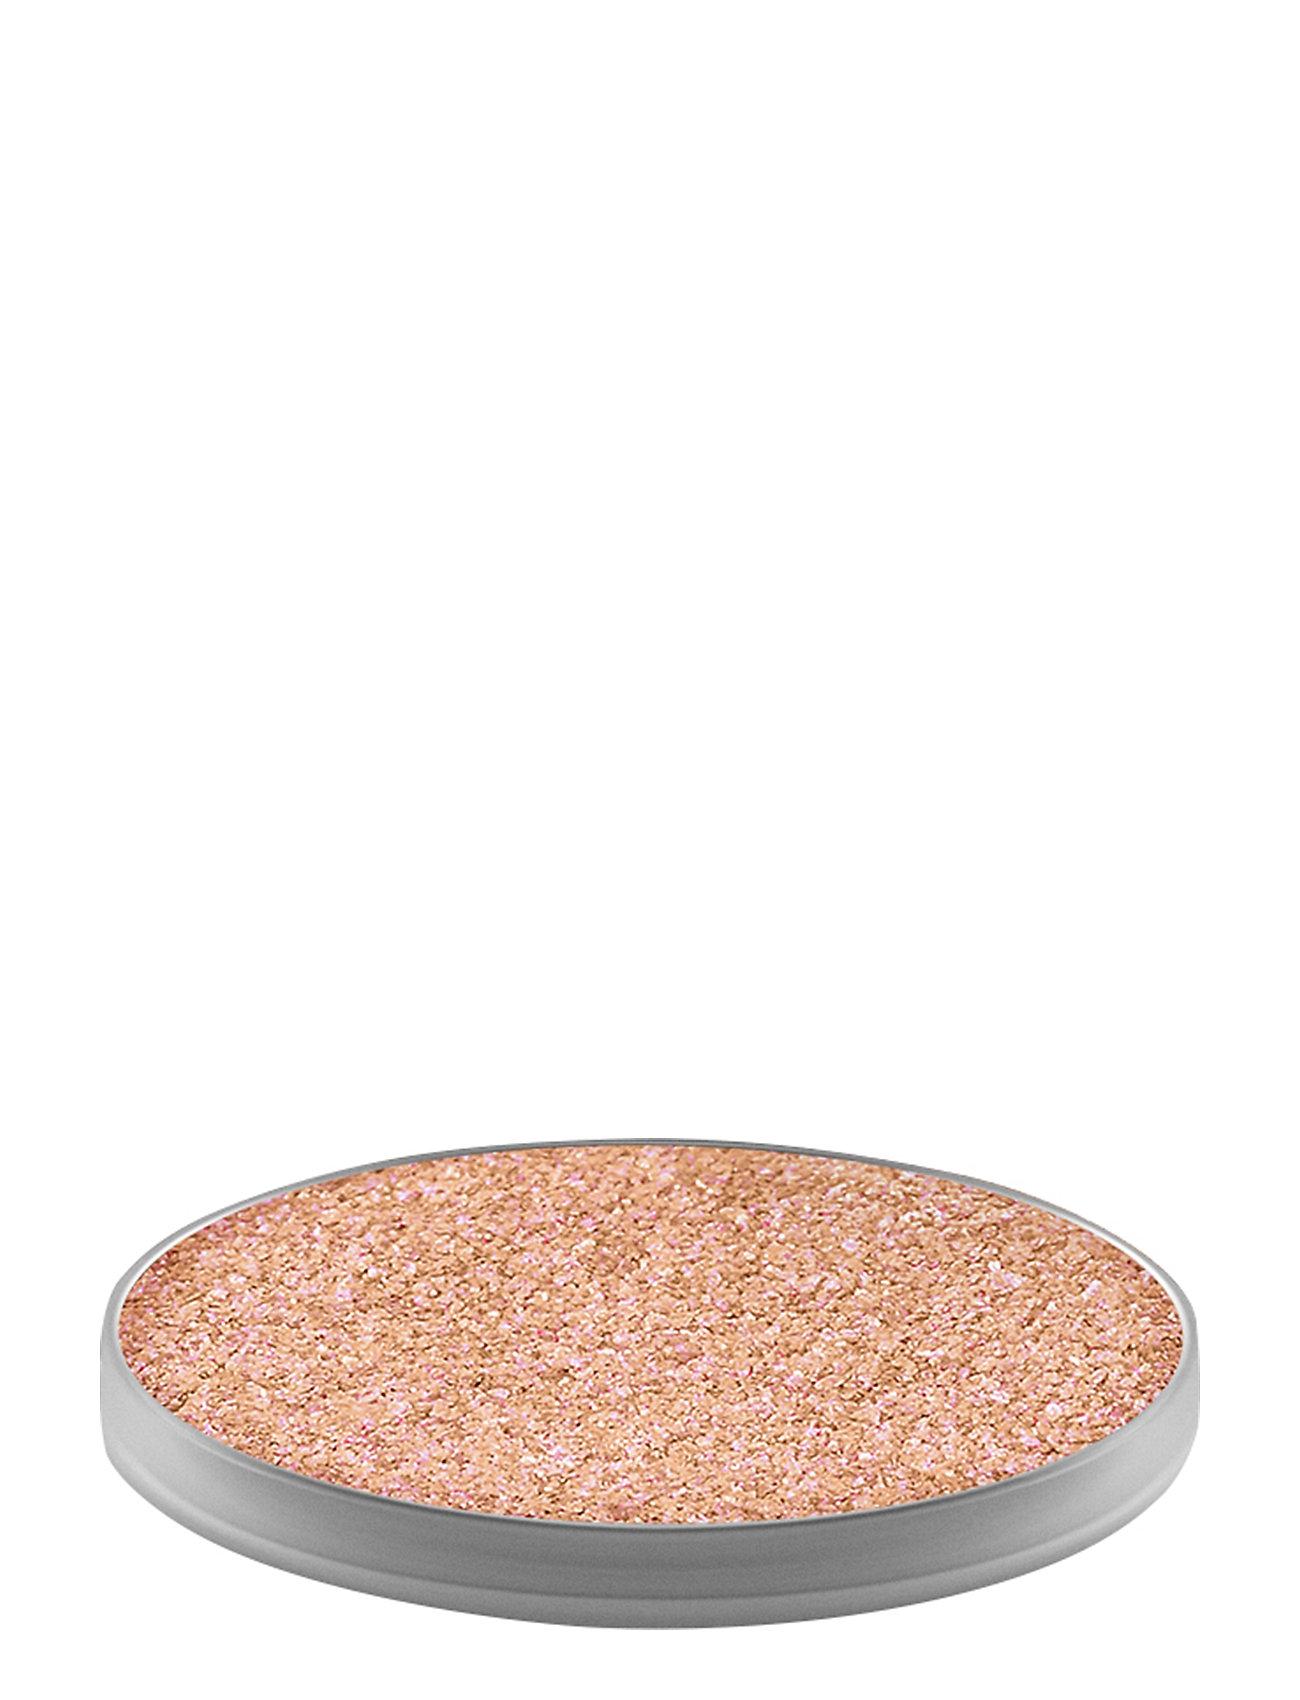 Image of Dazzleshadow Extreme Pro Palett Beauty WOMEN Makeup Eyes Eyeshadow - Not Palettes Beige M.A.C. (3366815301)